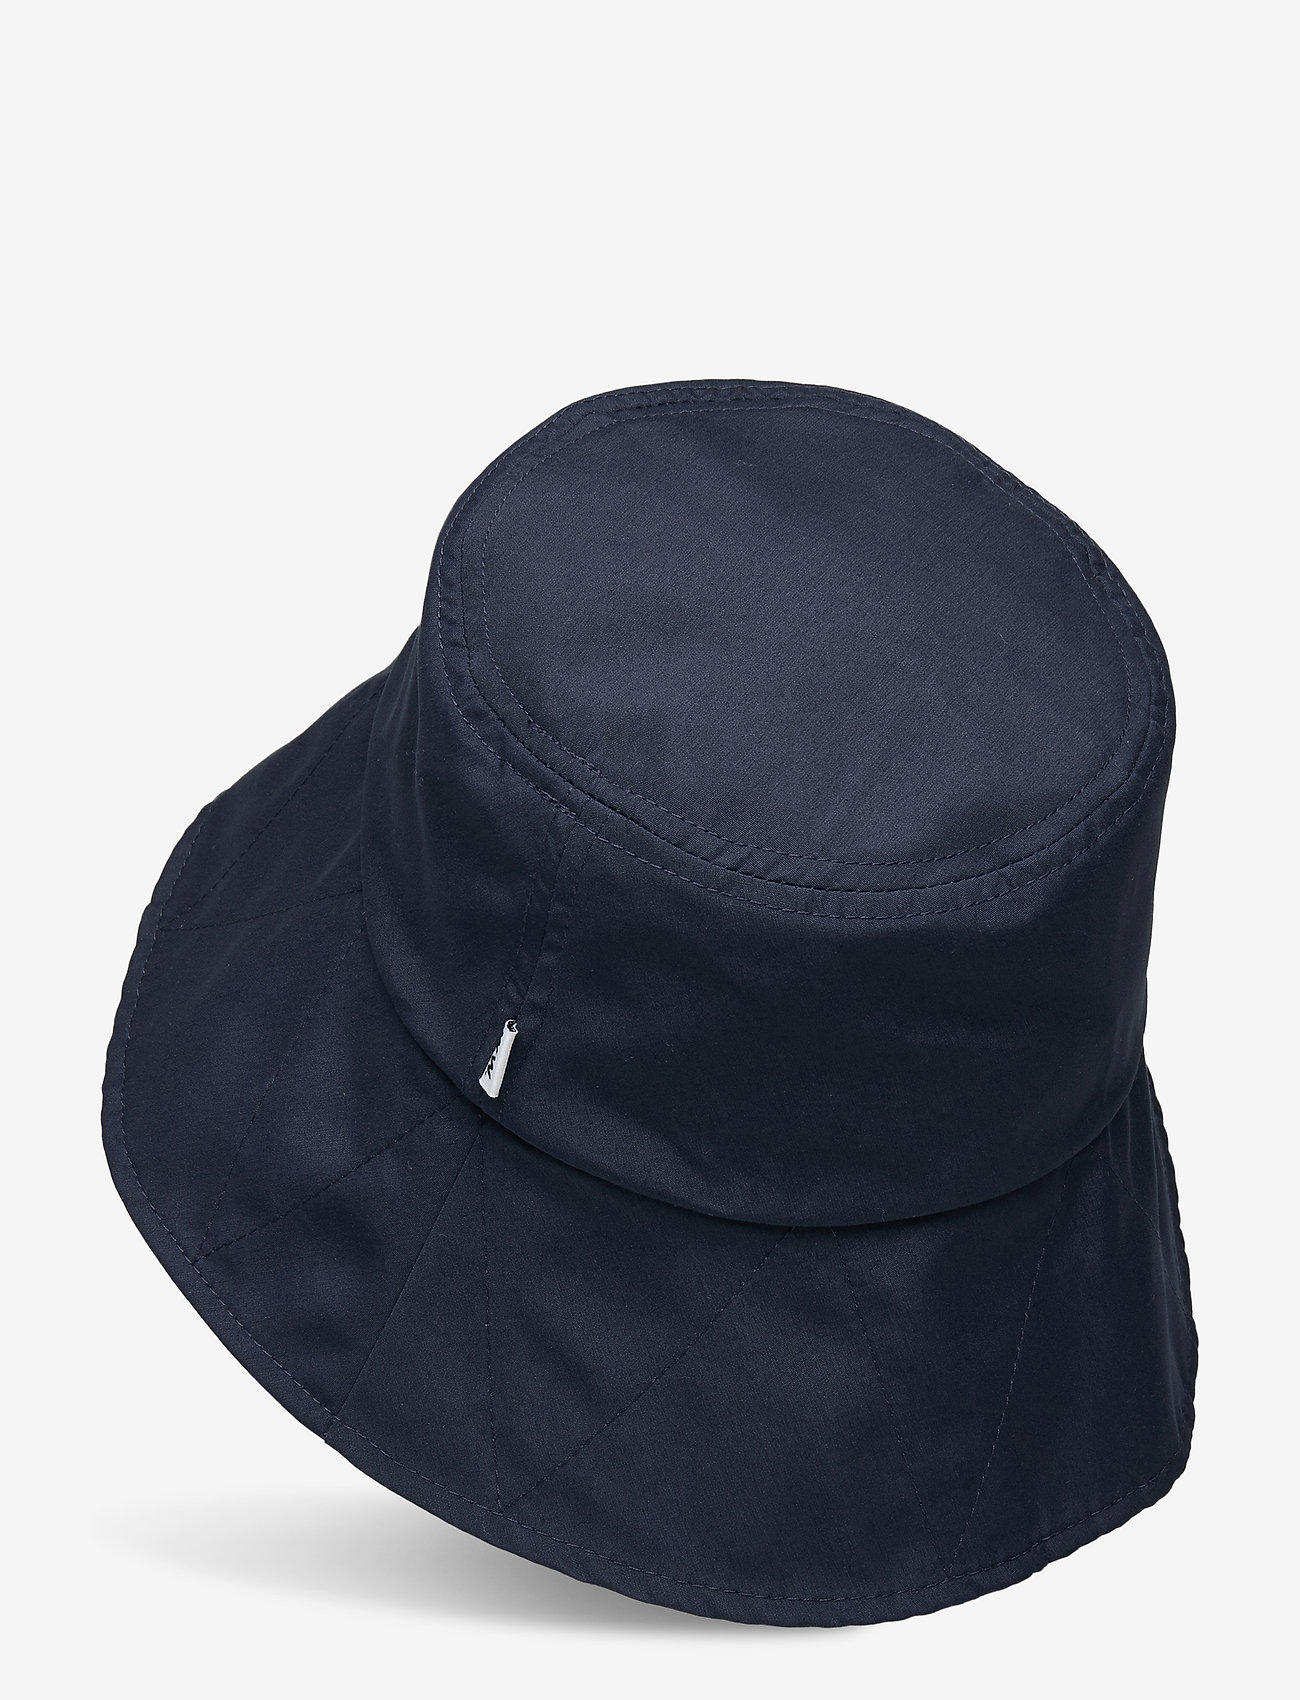 Wood Wood - Sun hat - emmer hoeden - navy - 1